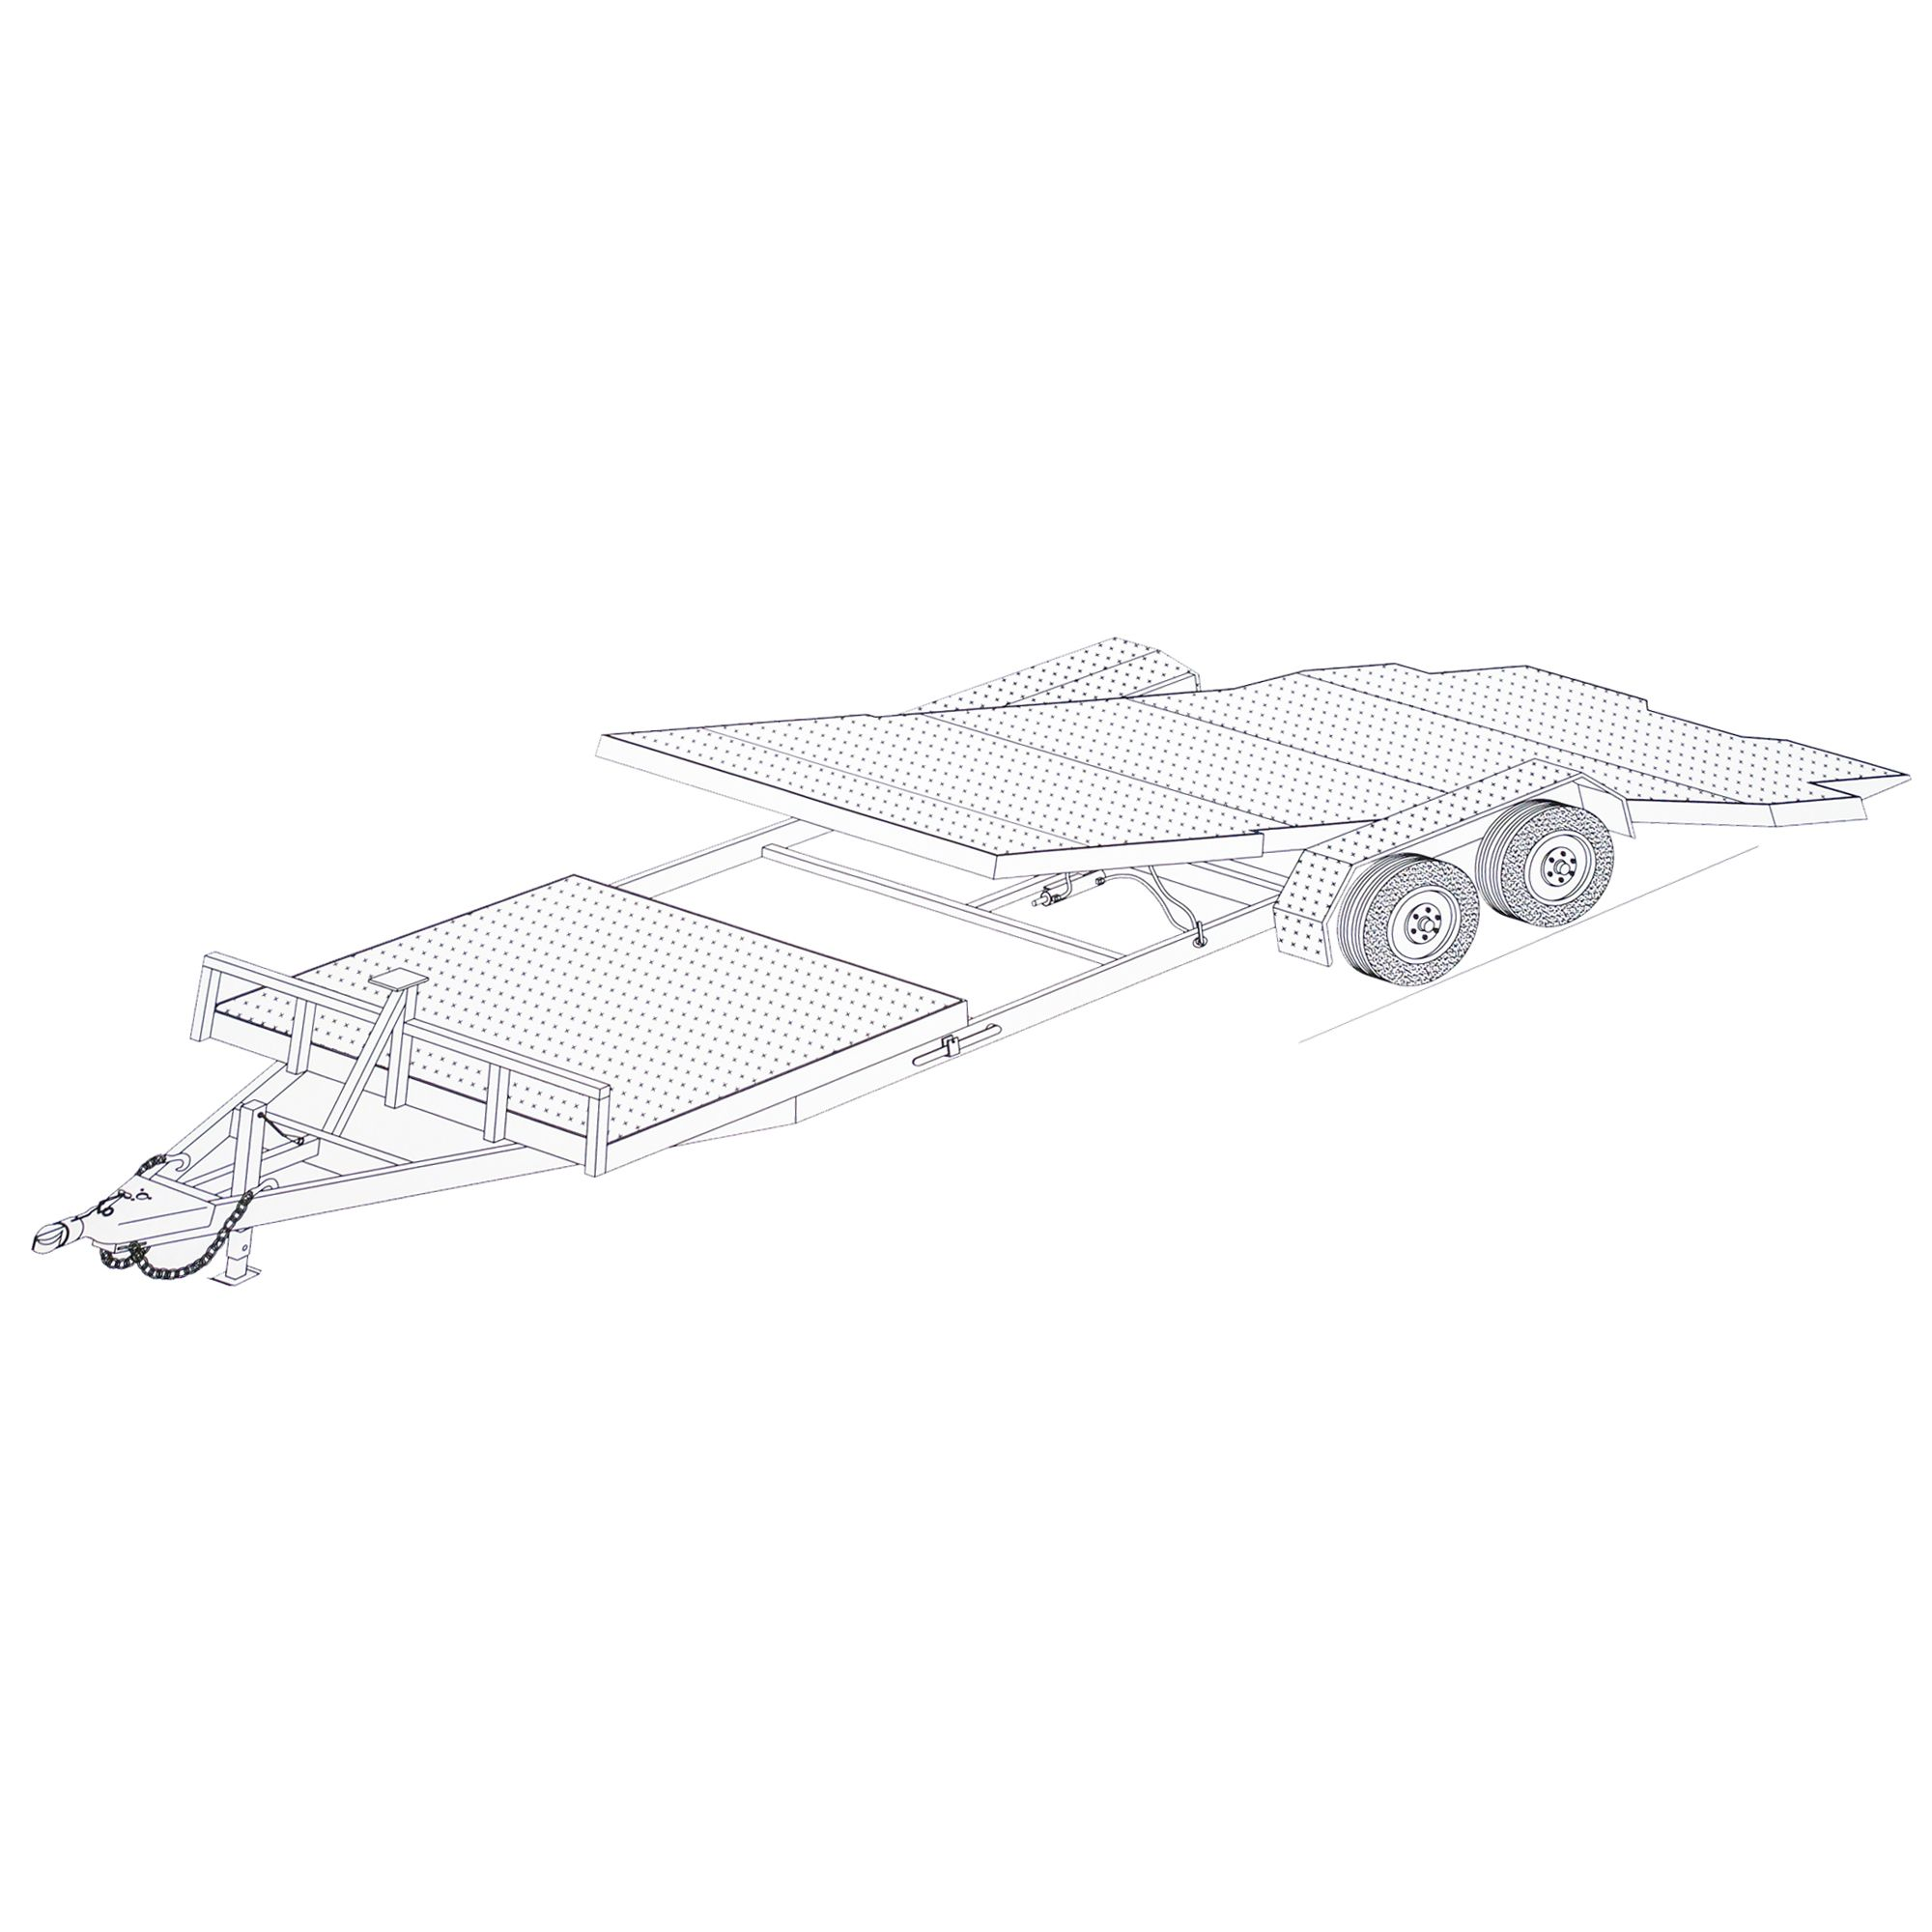 24 gravity tilt car hauler trailer plans blueprints model 24gt 24 gravity tilt car hauler trailer plans blueprints model 24gt johnson trailer malvernweather Images